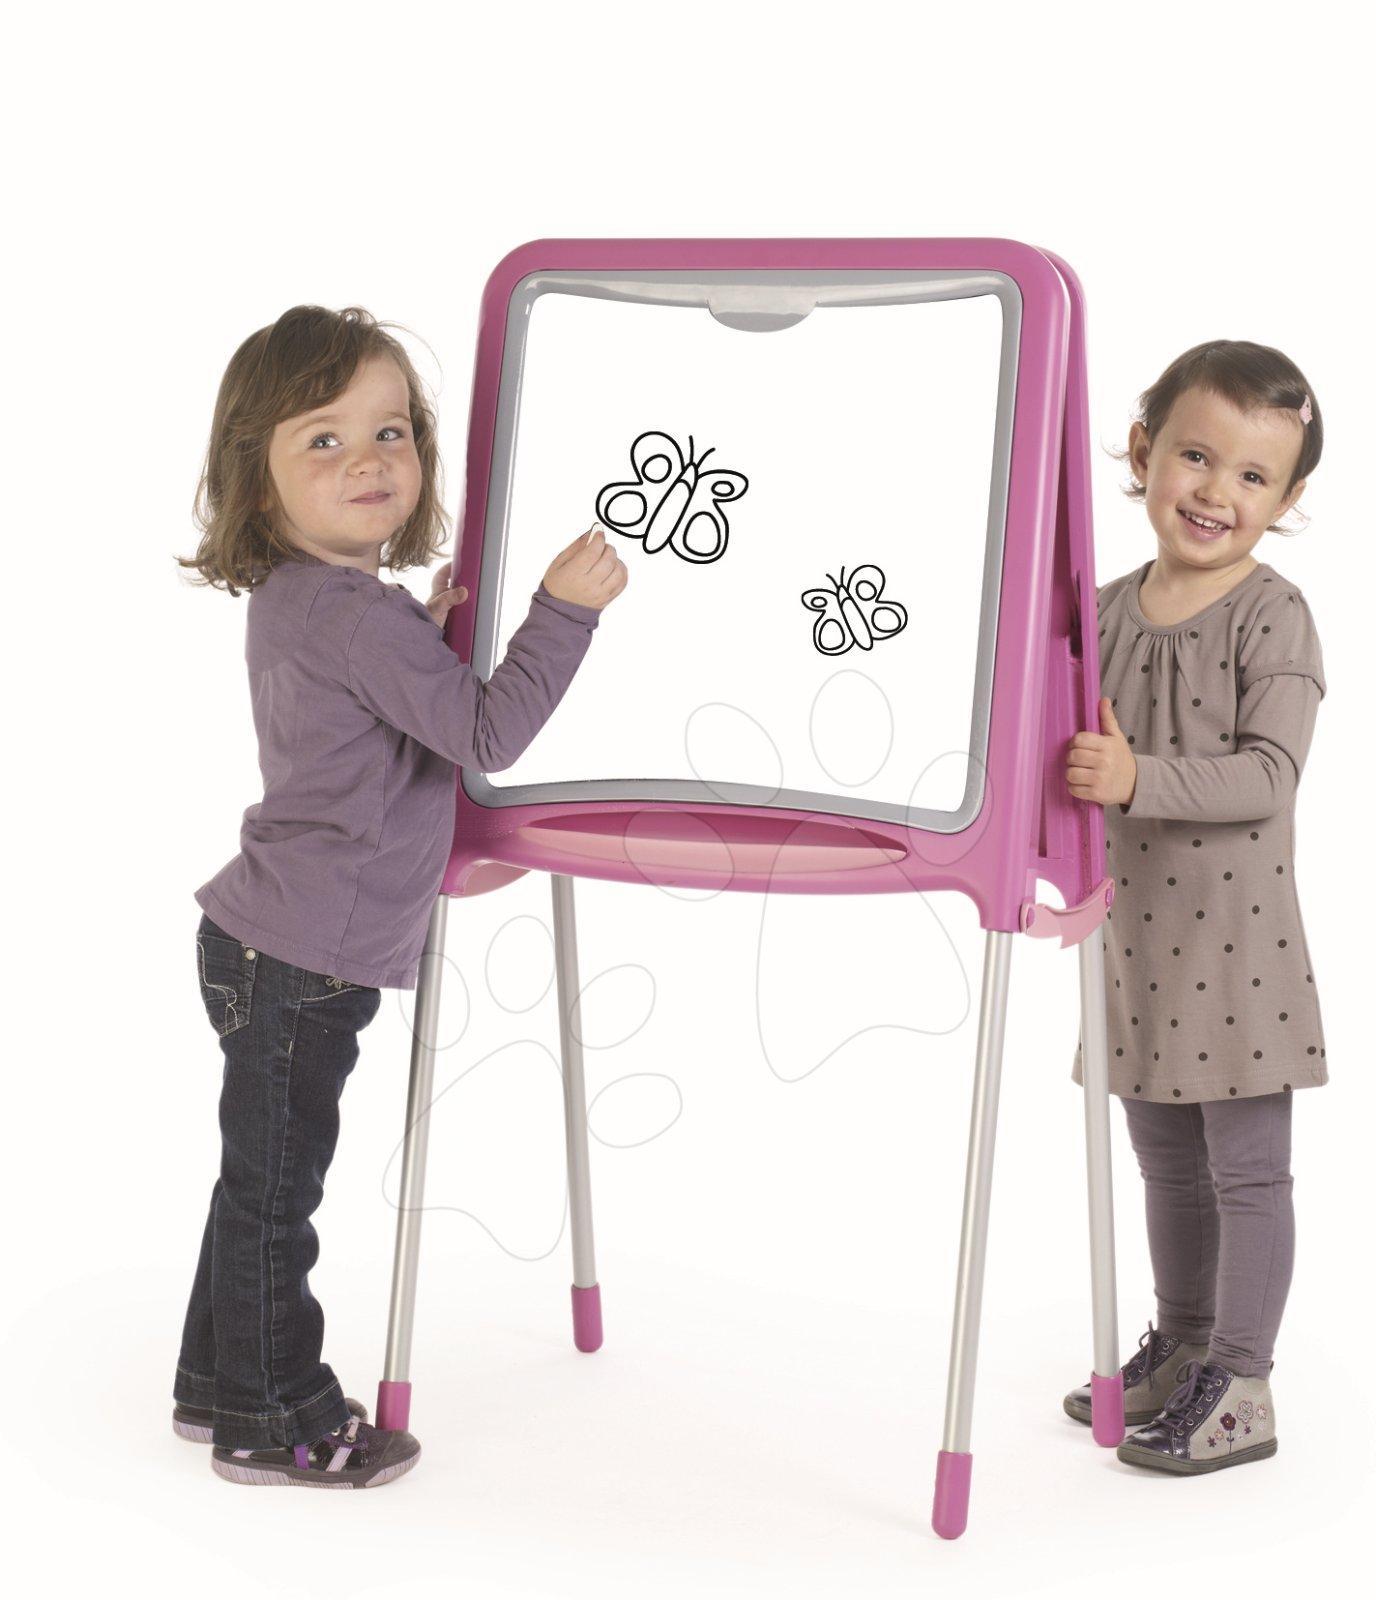 Detská magnetická tabuľa smoby obojstranná ba00ae1d12c